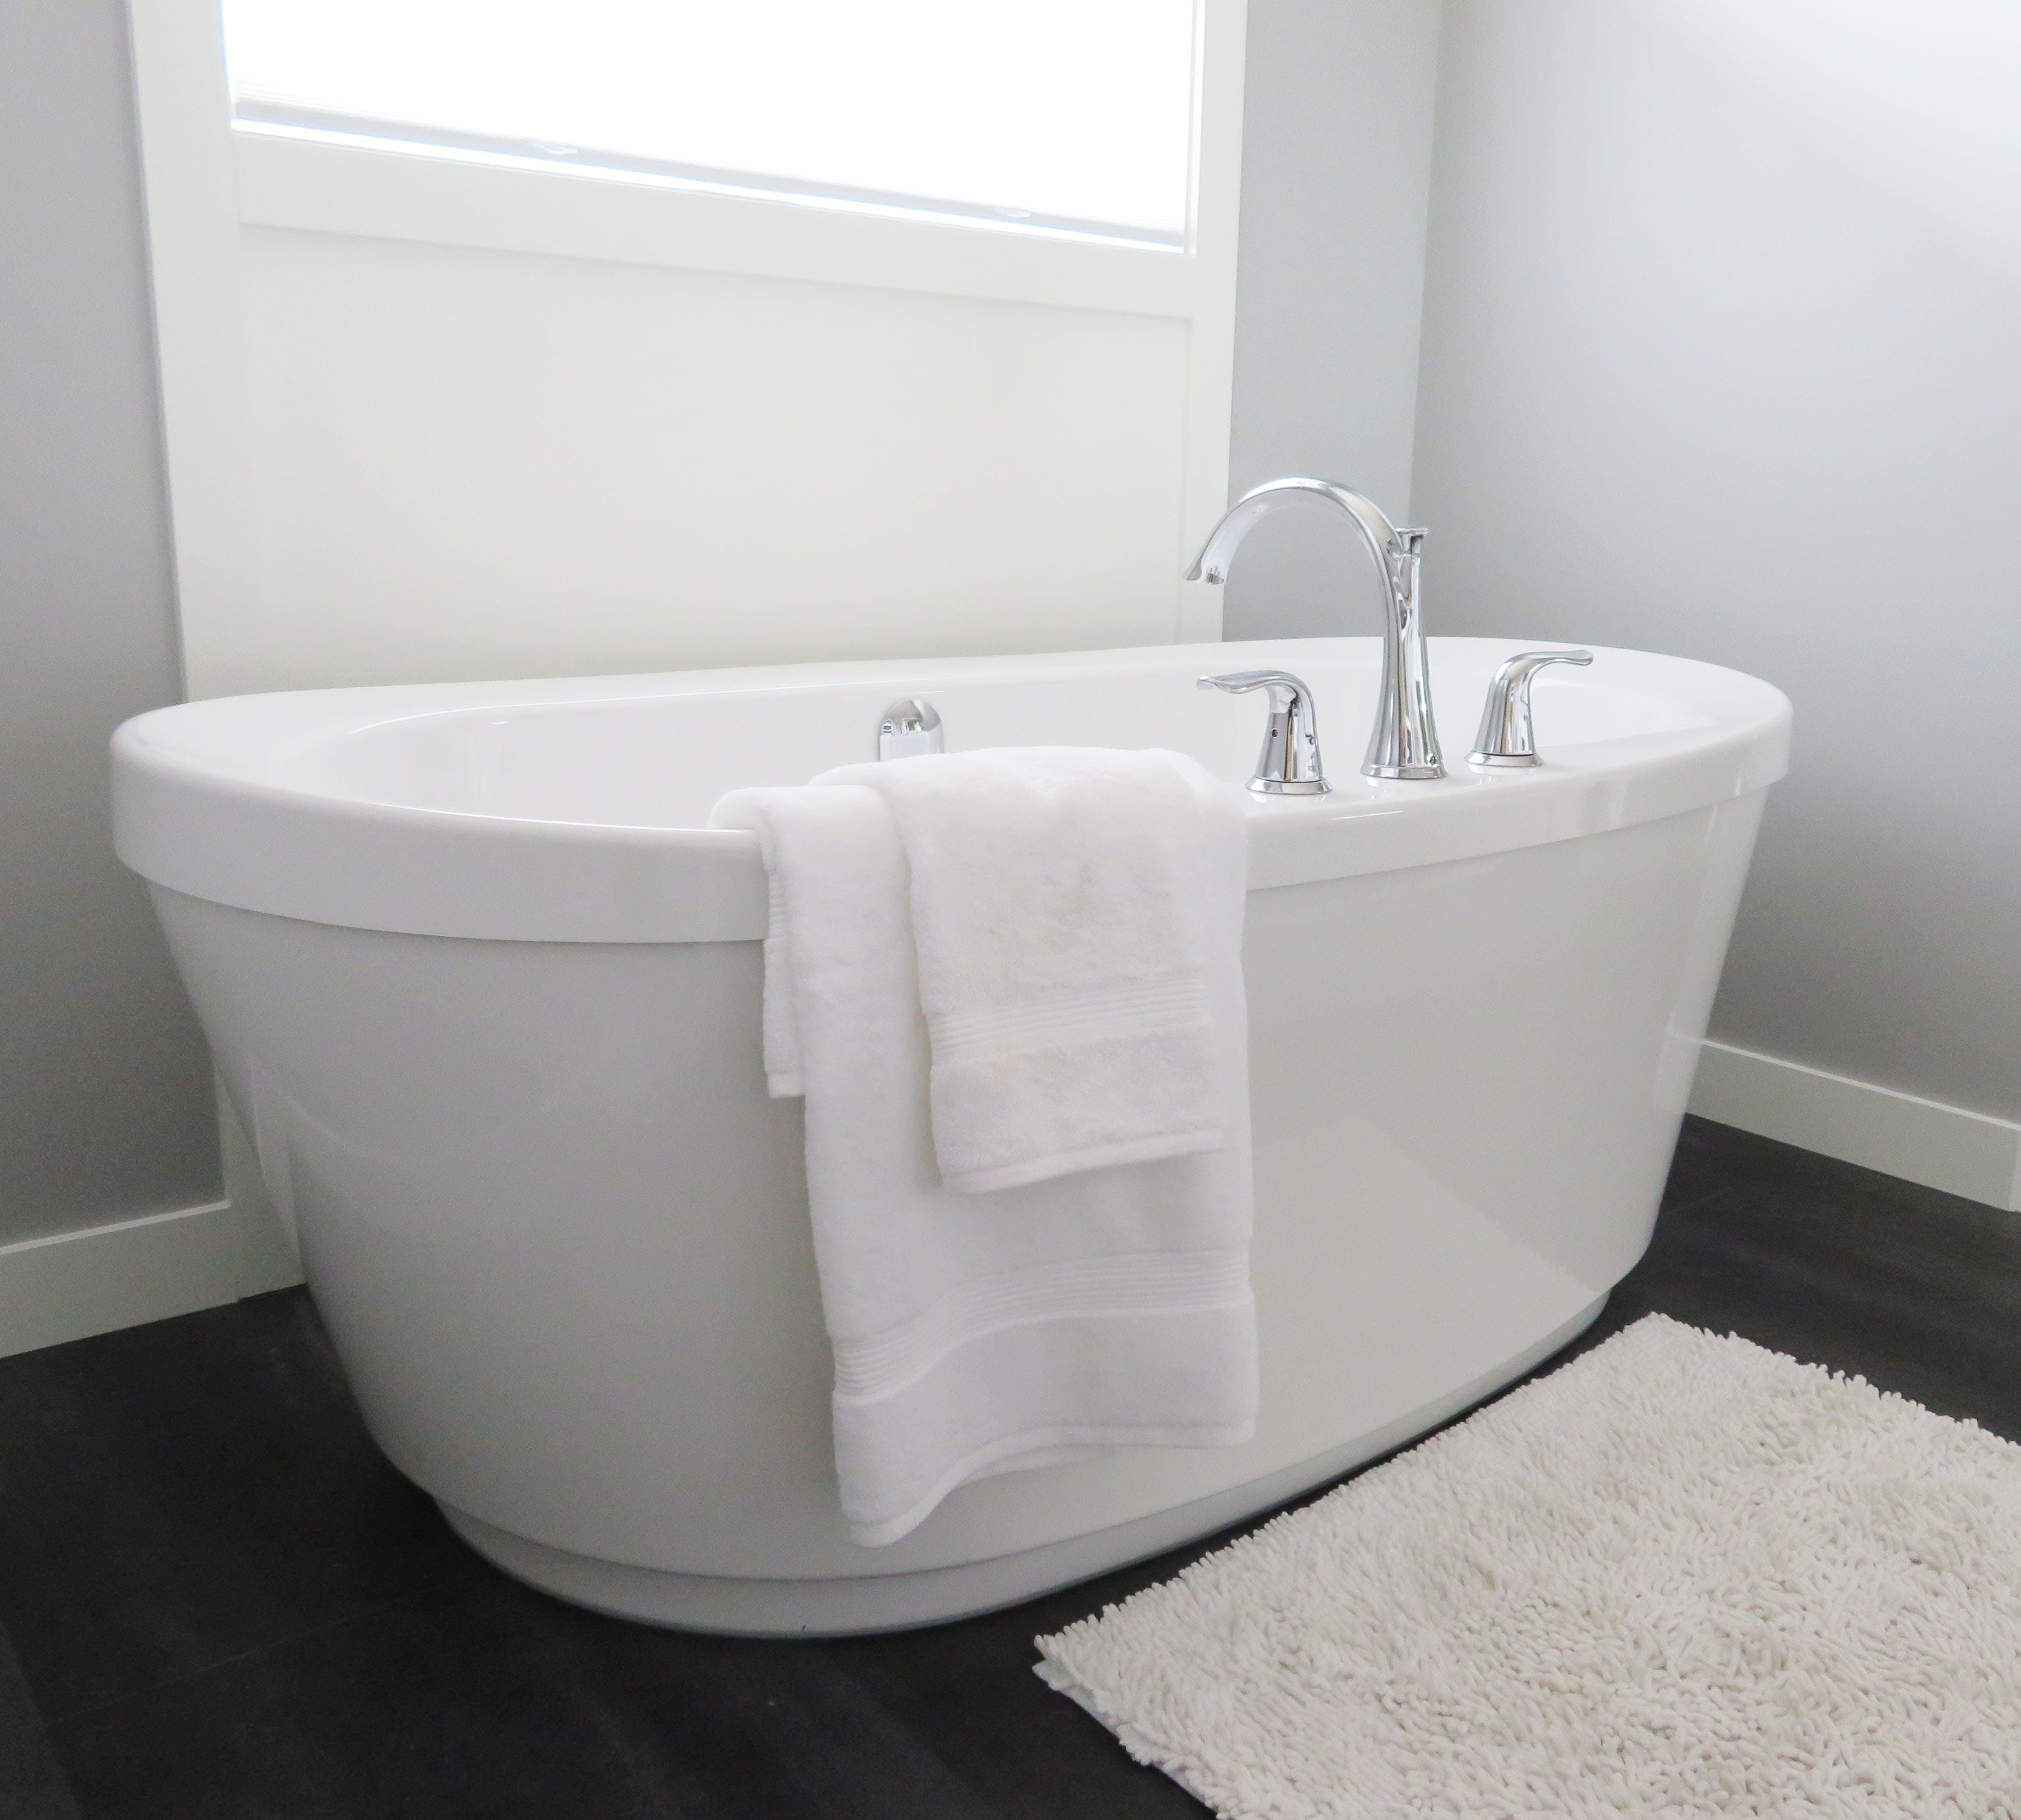 Fotos de stock gratuitas de adentro, alfombra, bañera, baño